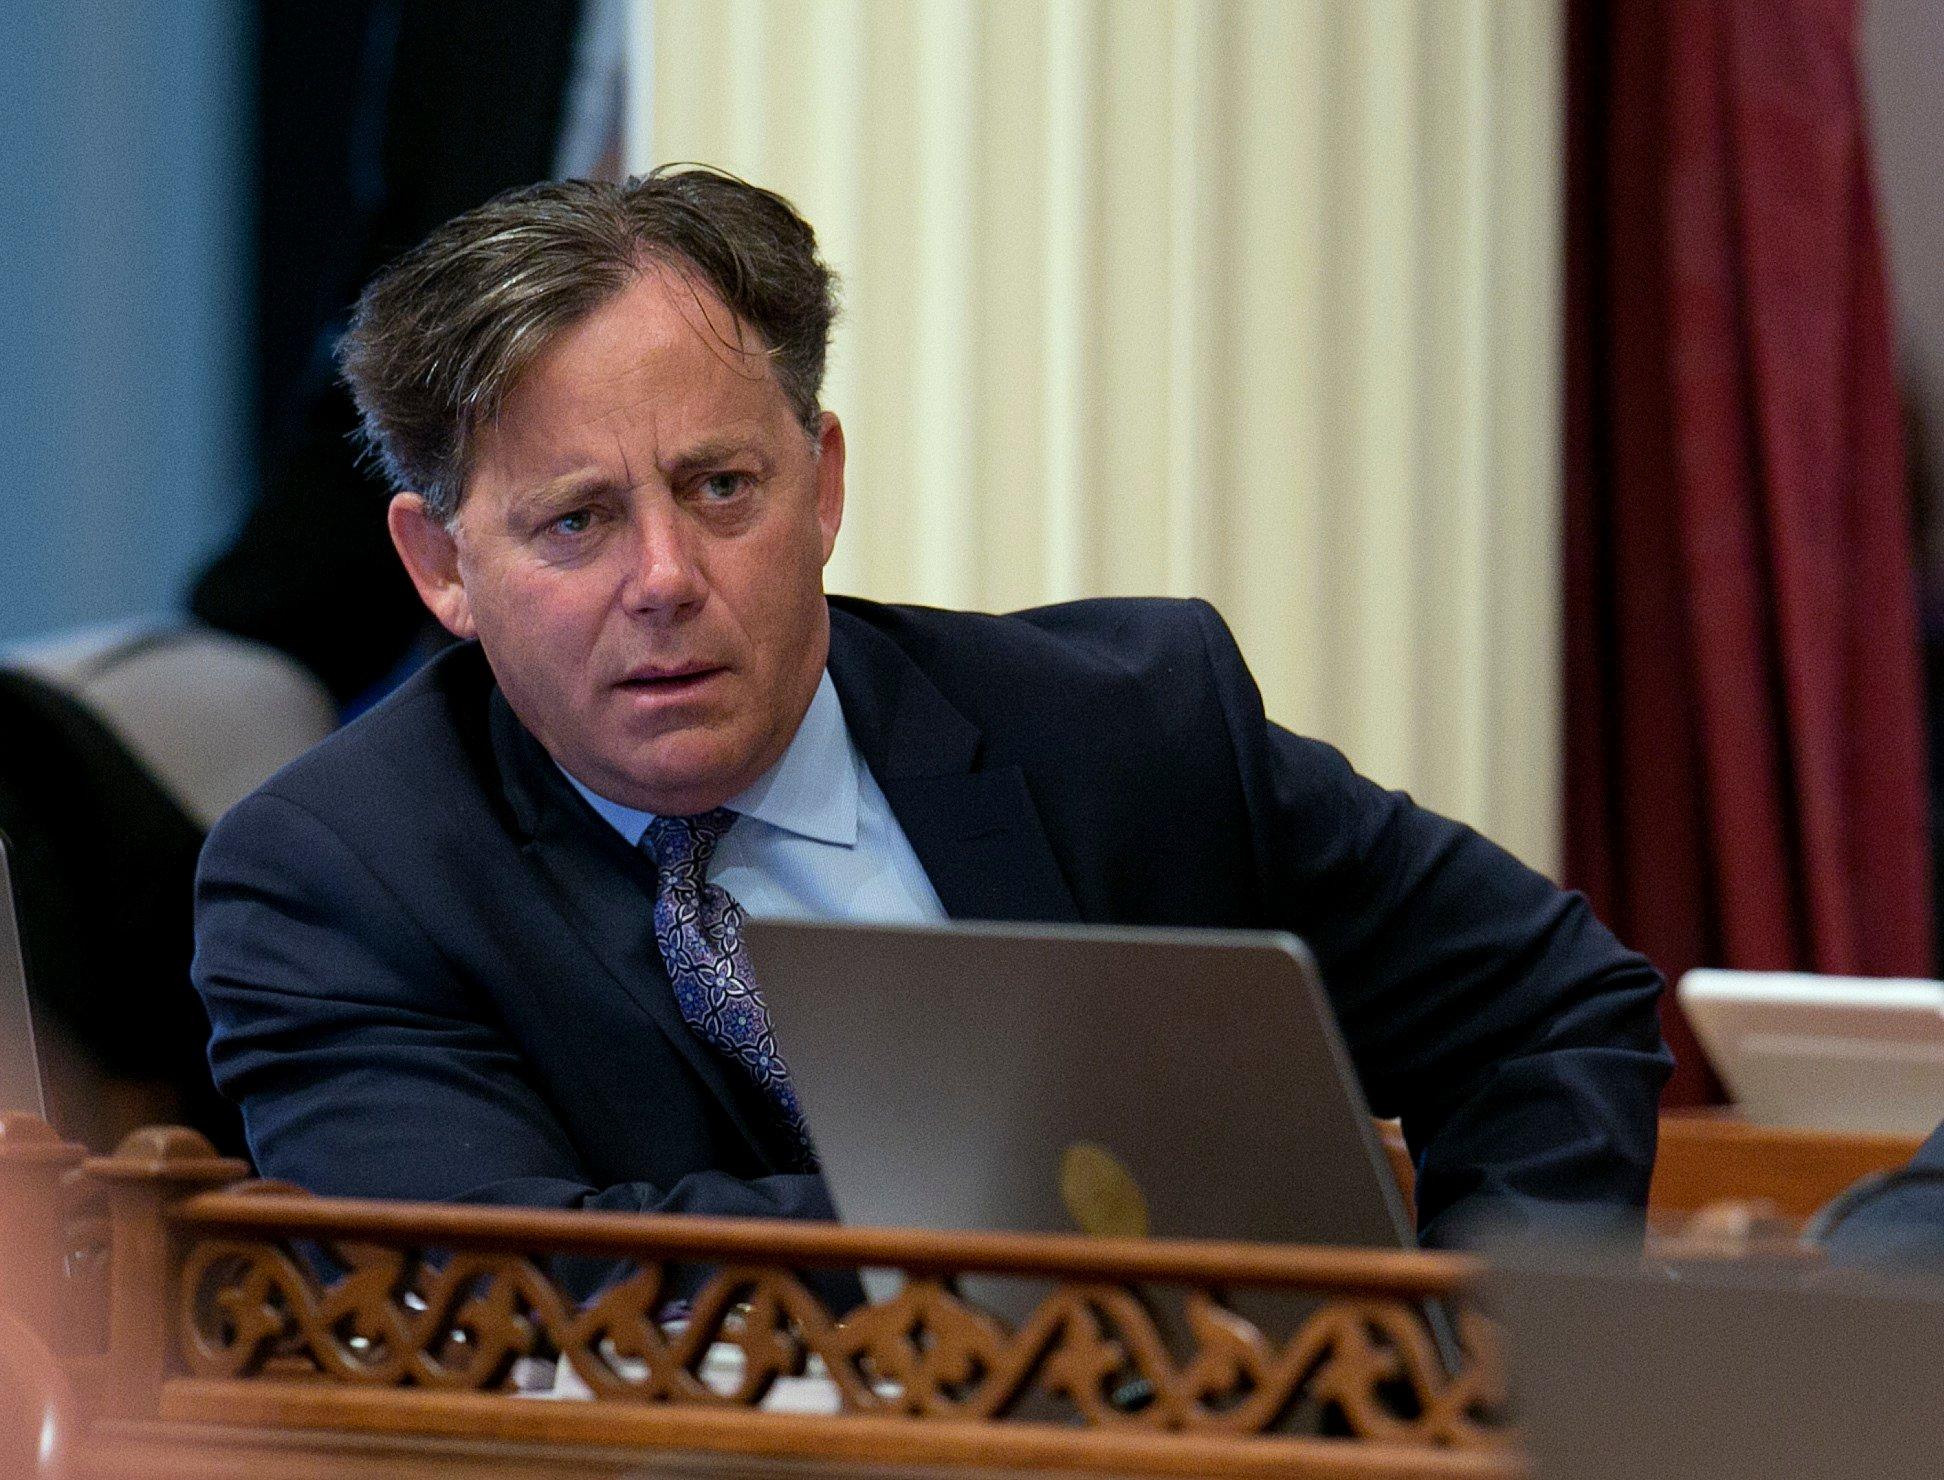 State Sen. Josh Newman, D-Fullerton, left, listens as lawmakers debate a recall election measure. (AP Photo/Rich Pedroncelli)